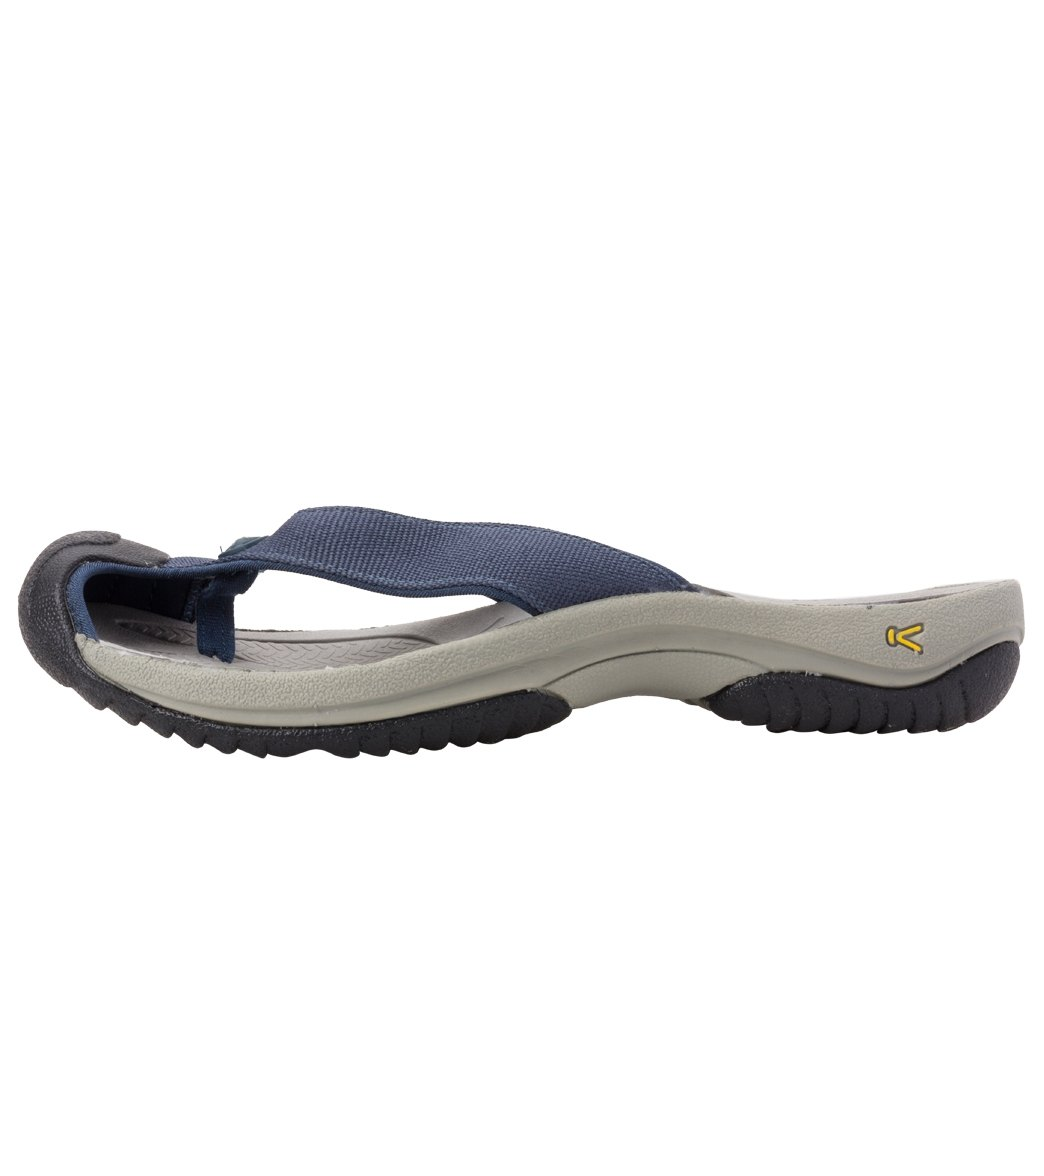 2956ff0b8be1 Keen Men s Waimea H2 Sandal at SwimOutlet.com - Free Shipping